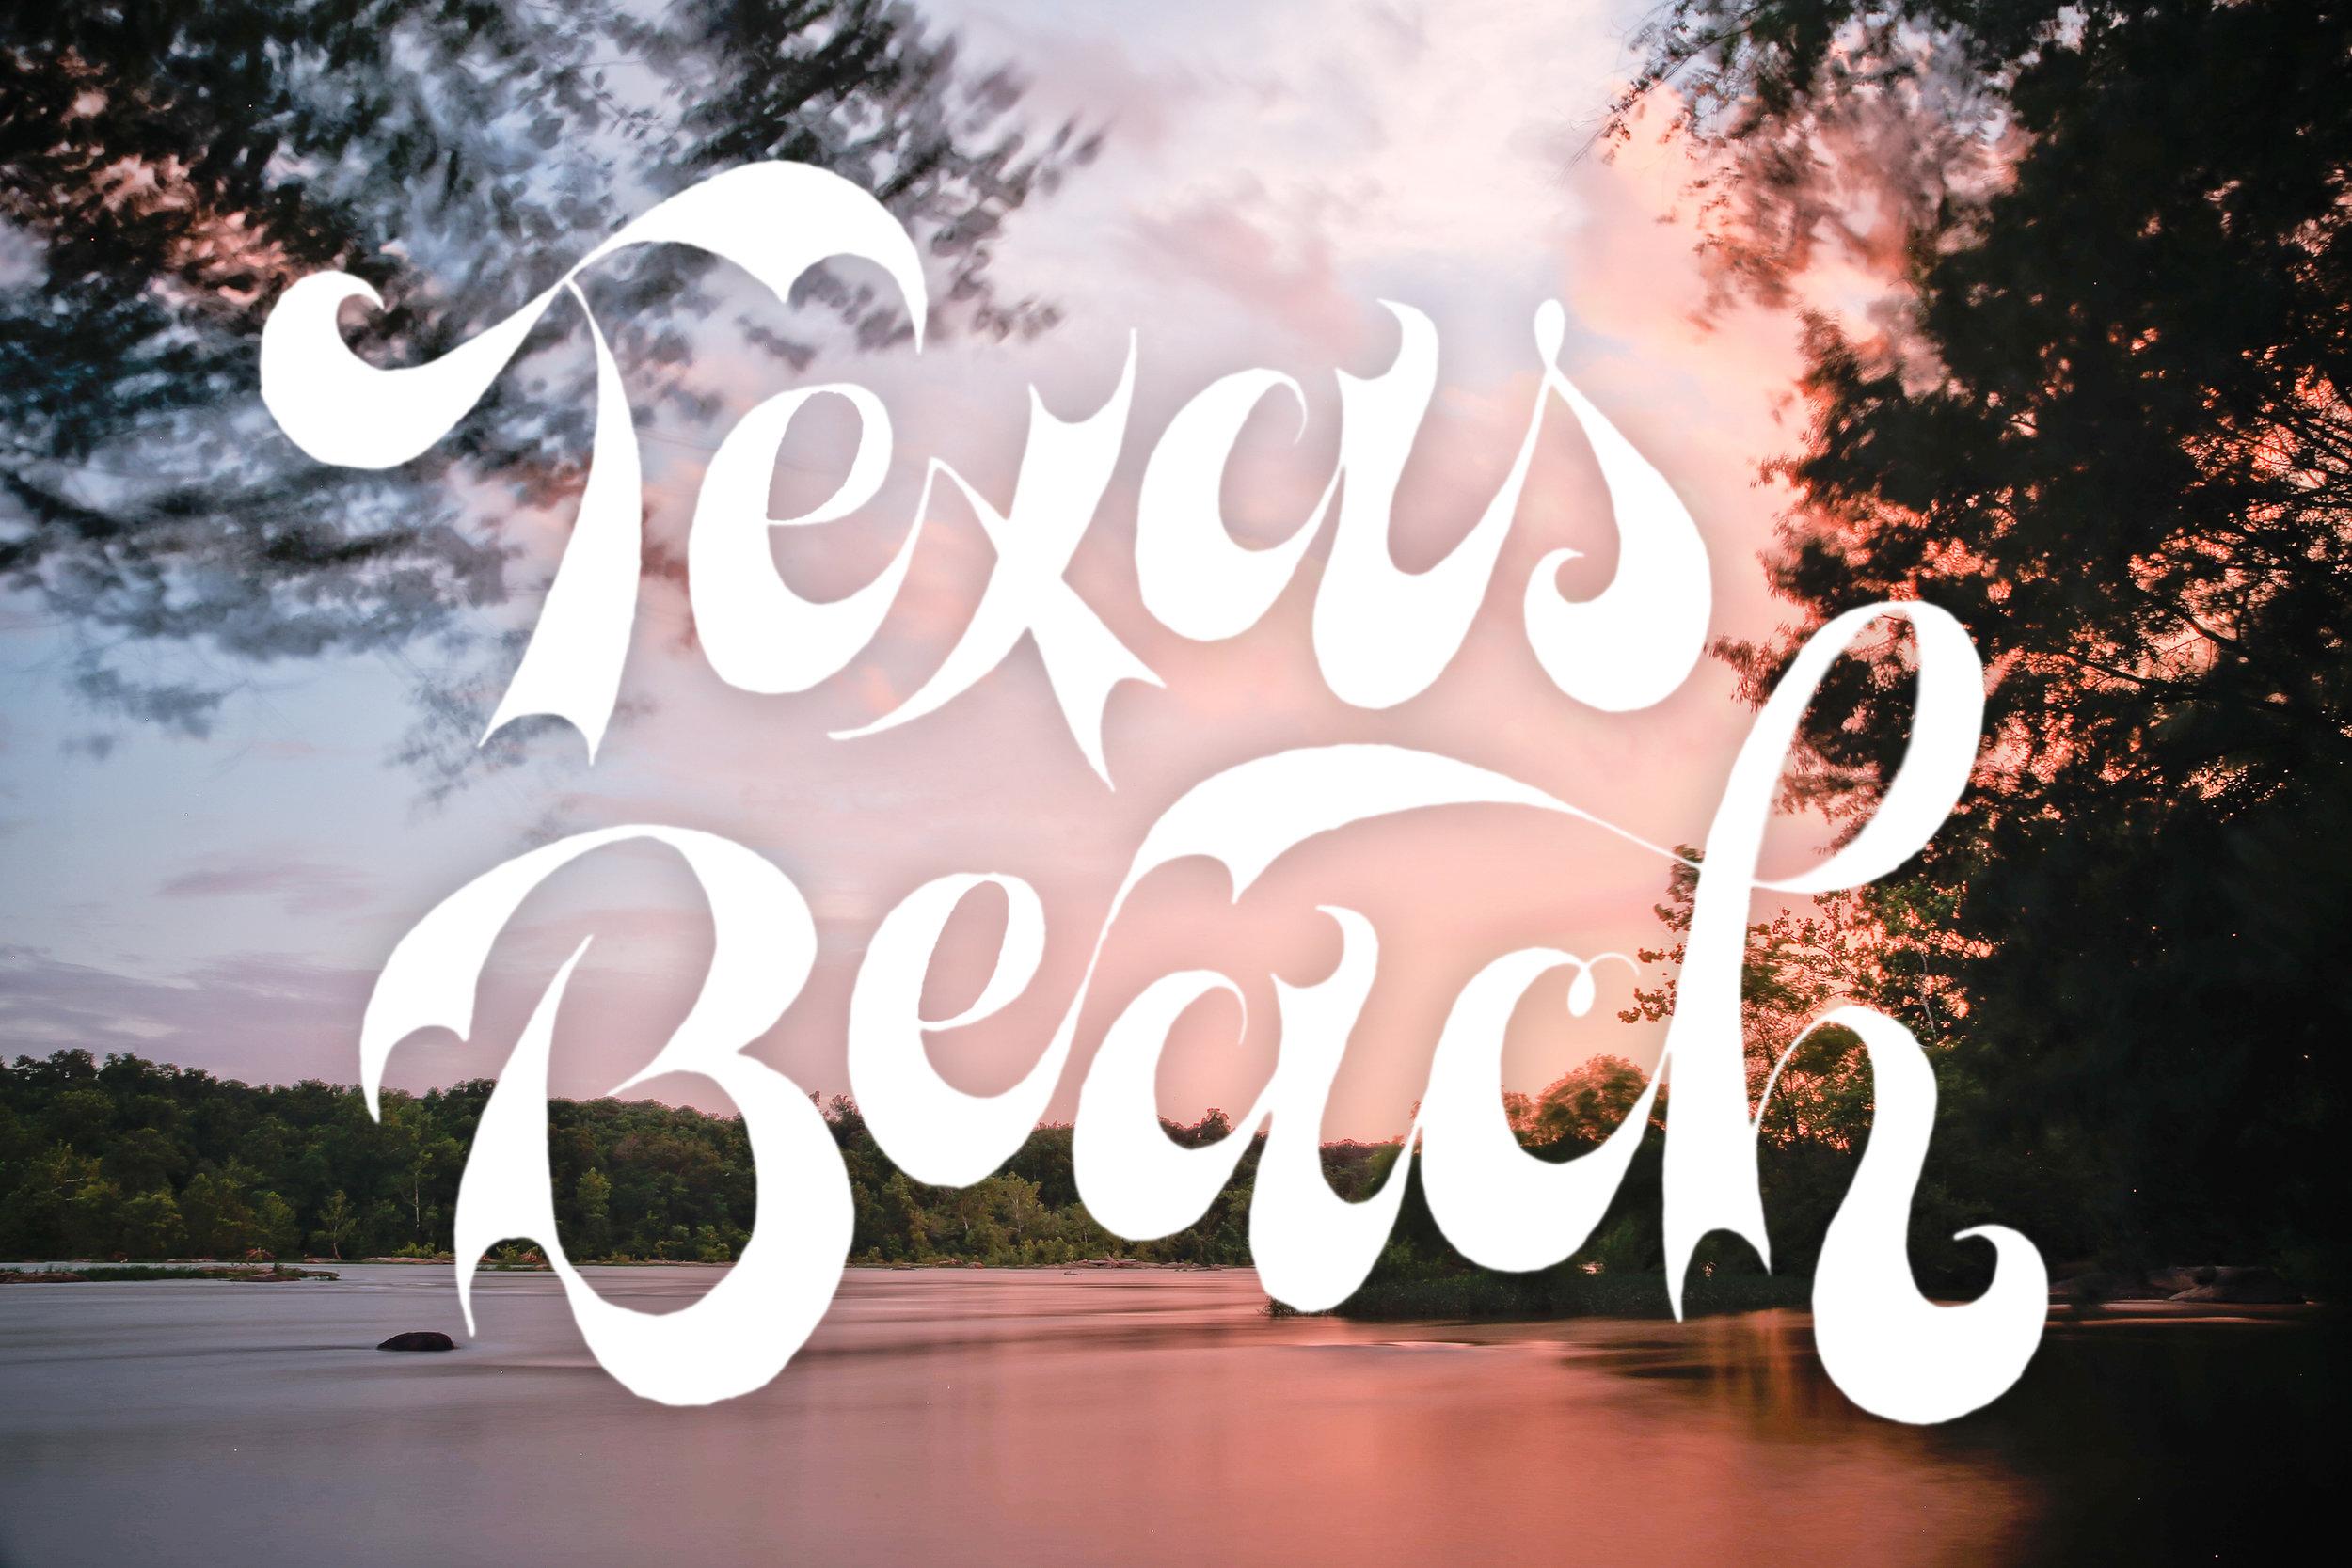 Texas-Beach-hand-lettering.jpg